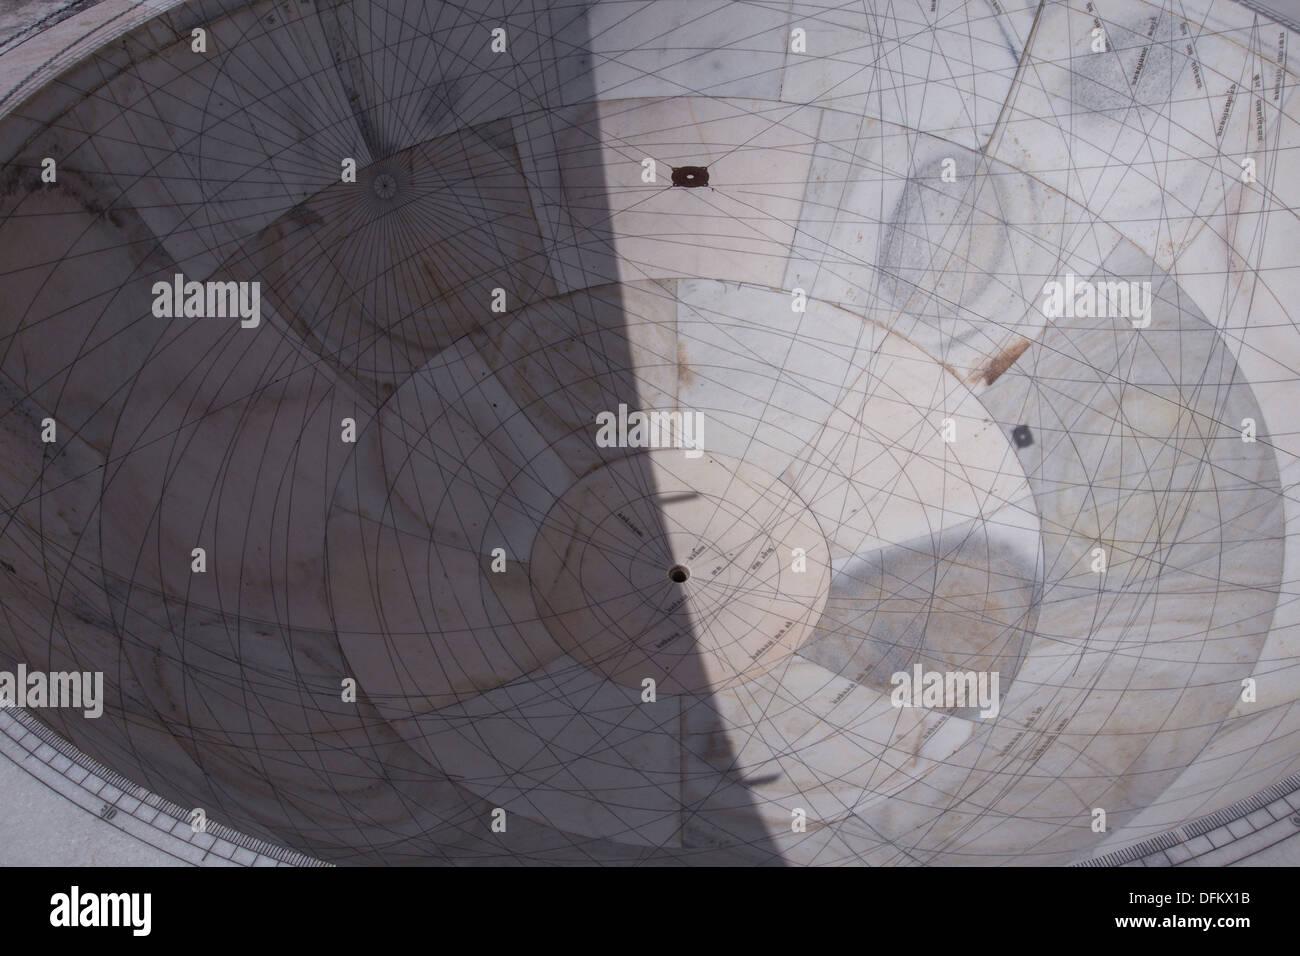 Jantar Mantar a Jaipur è una collezione di architettura di strumenti astronomici. Immagini Stock